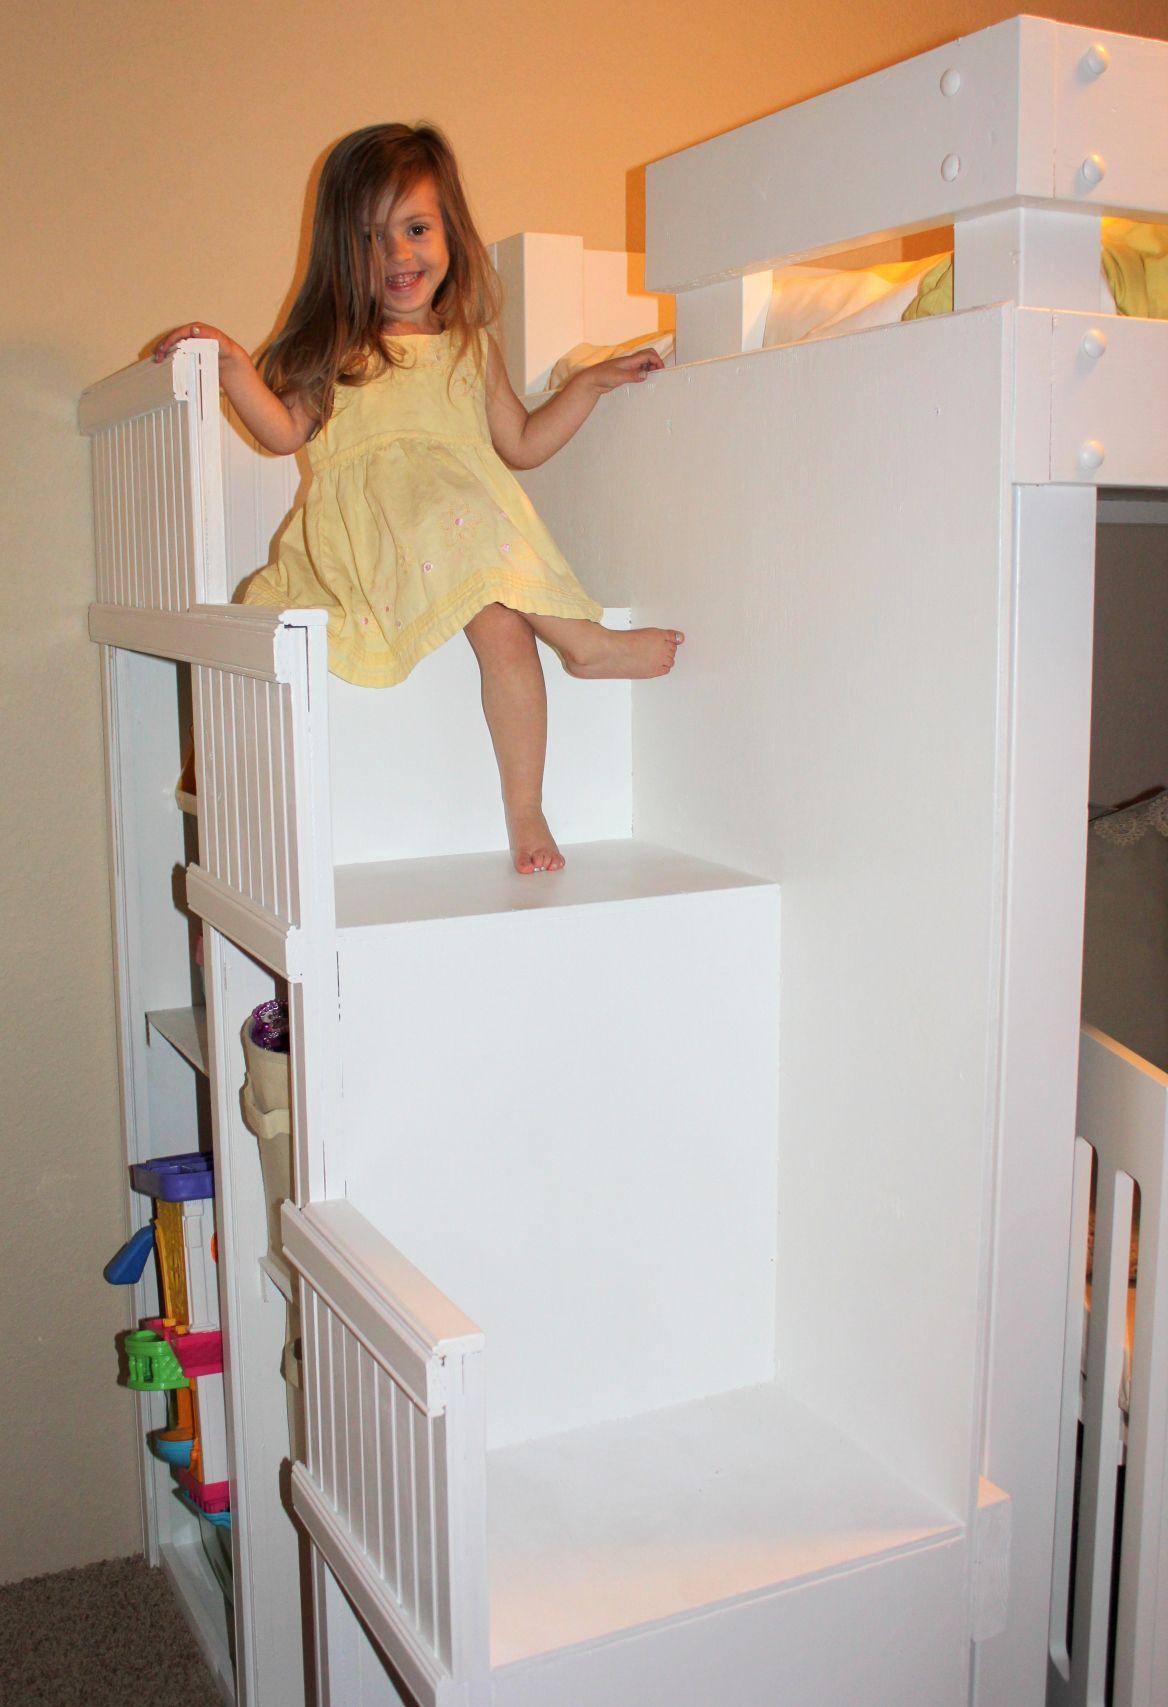 diy bunk beds Diy bunk bed, Bunk beds, Baby girl bedroom